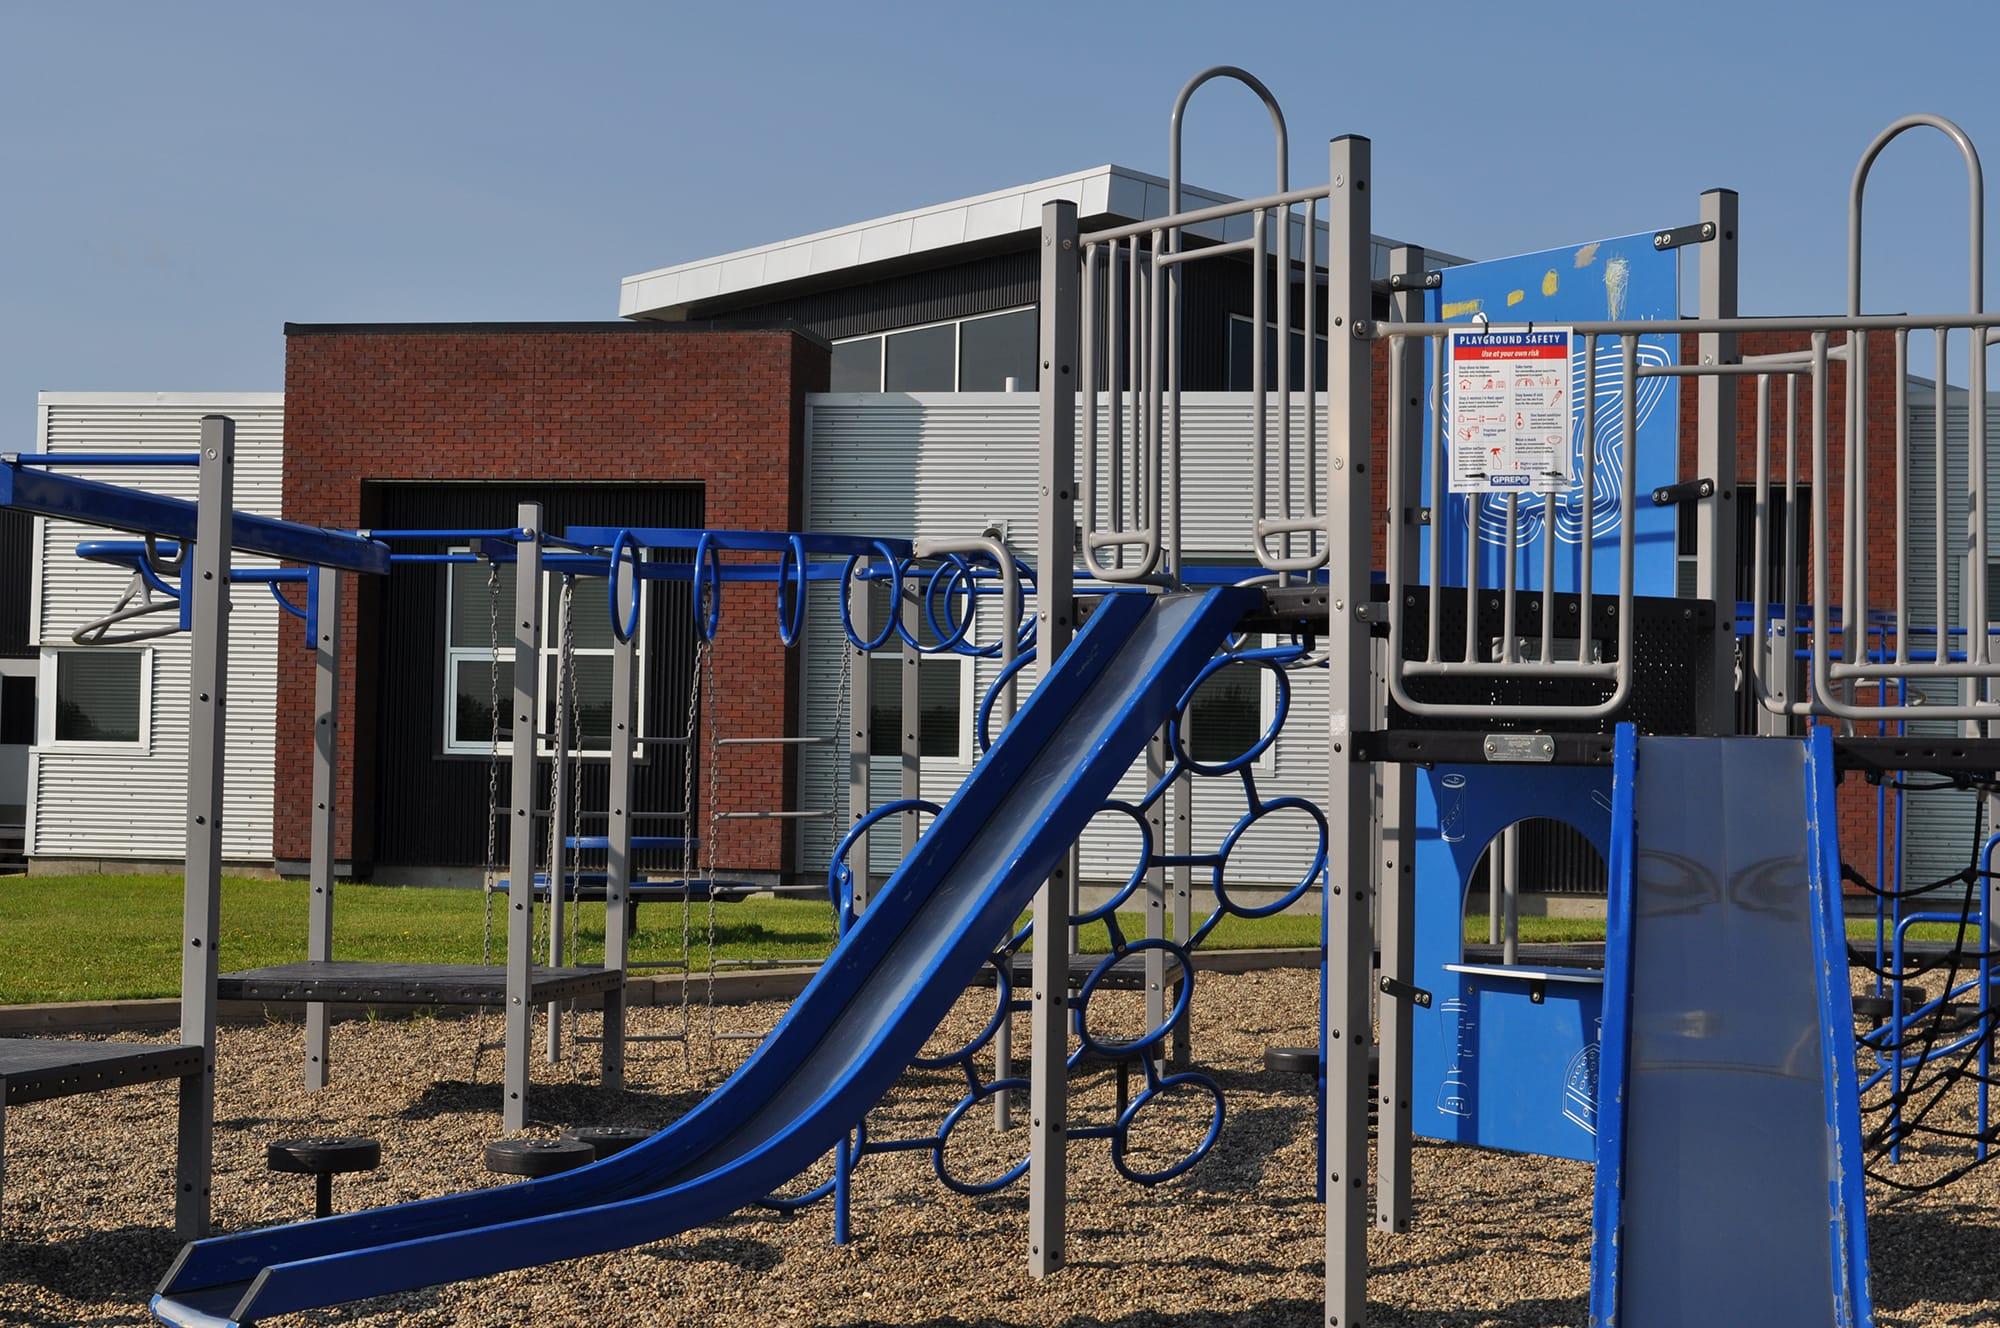 Clairmont Community School and Wellington Resource Centre playground